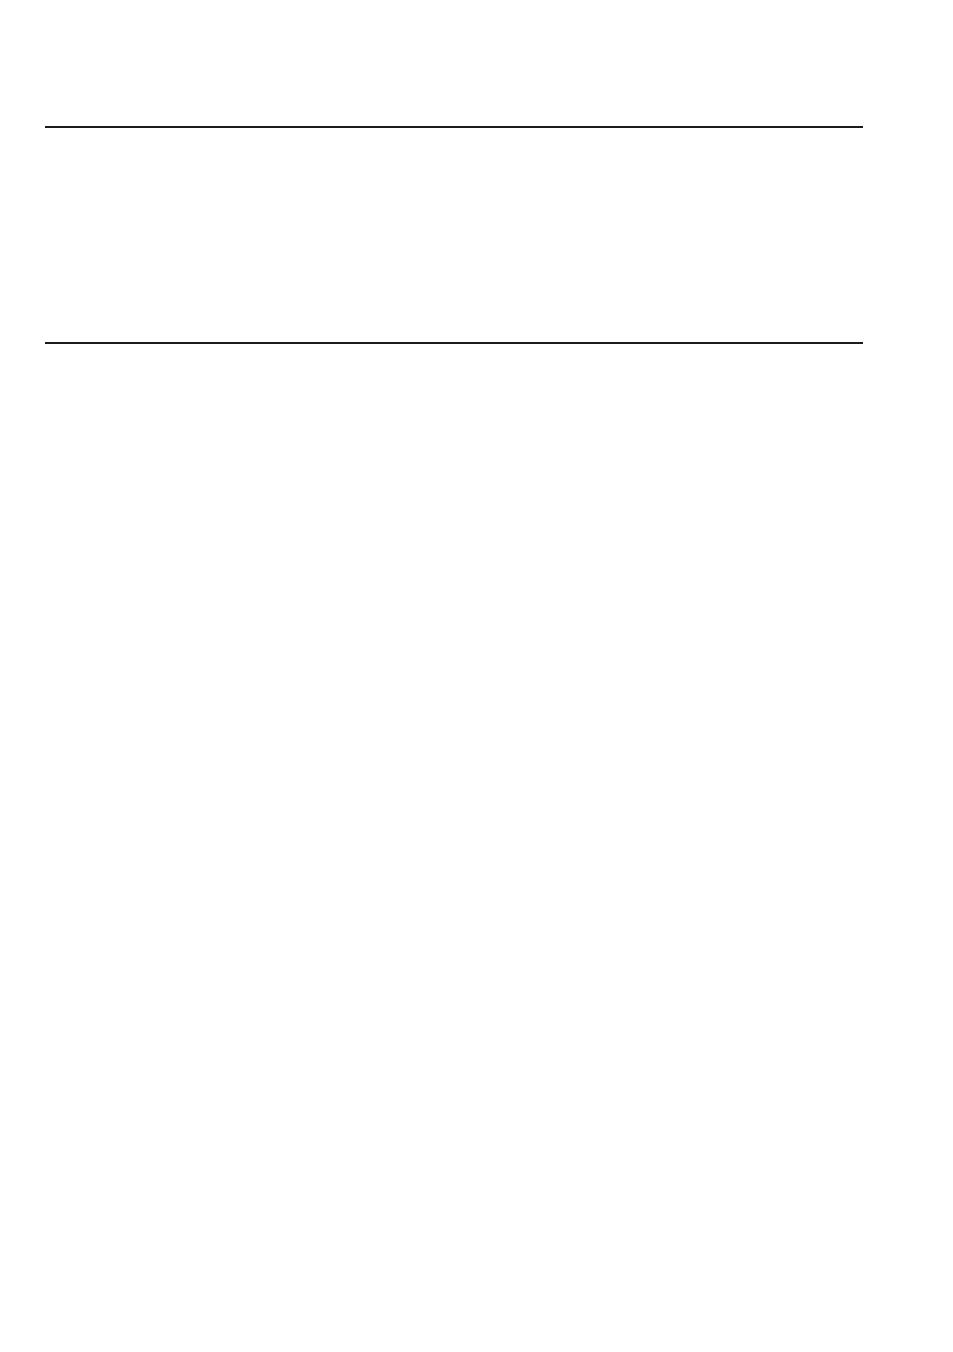 Протерм Тло 20 инструкция - картинка 2